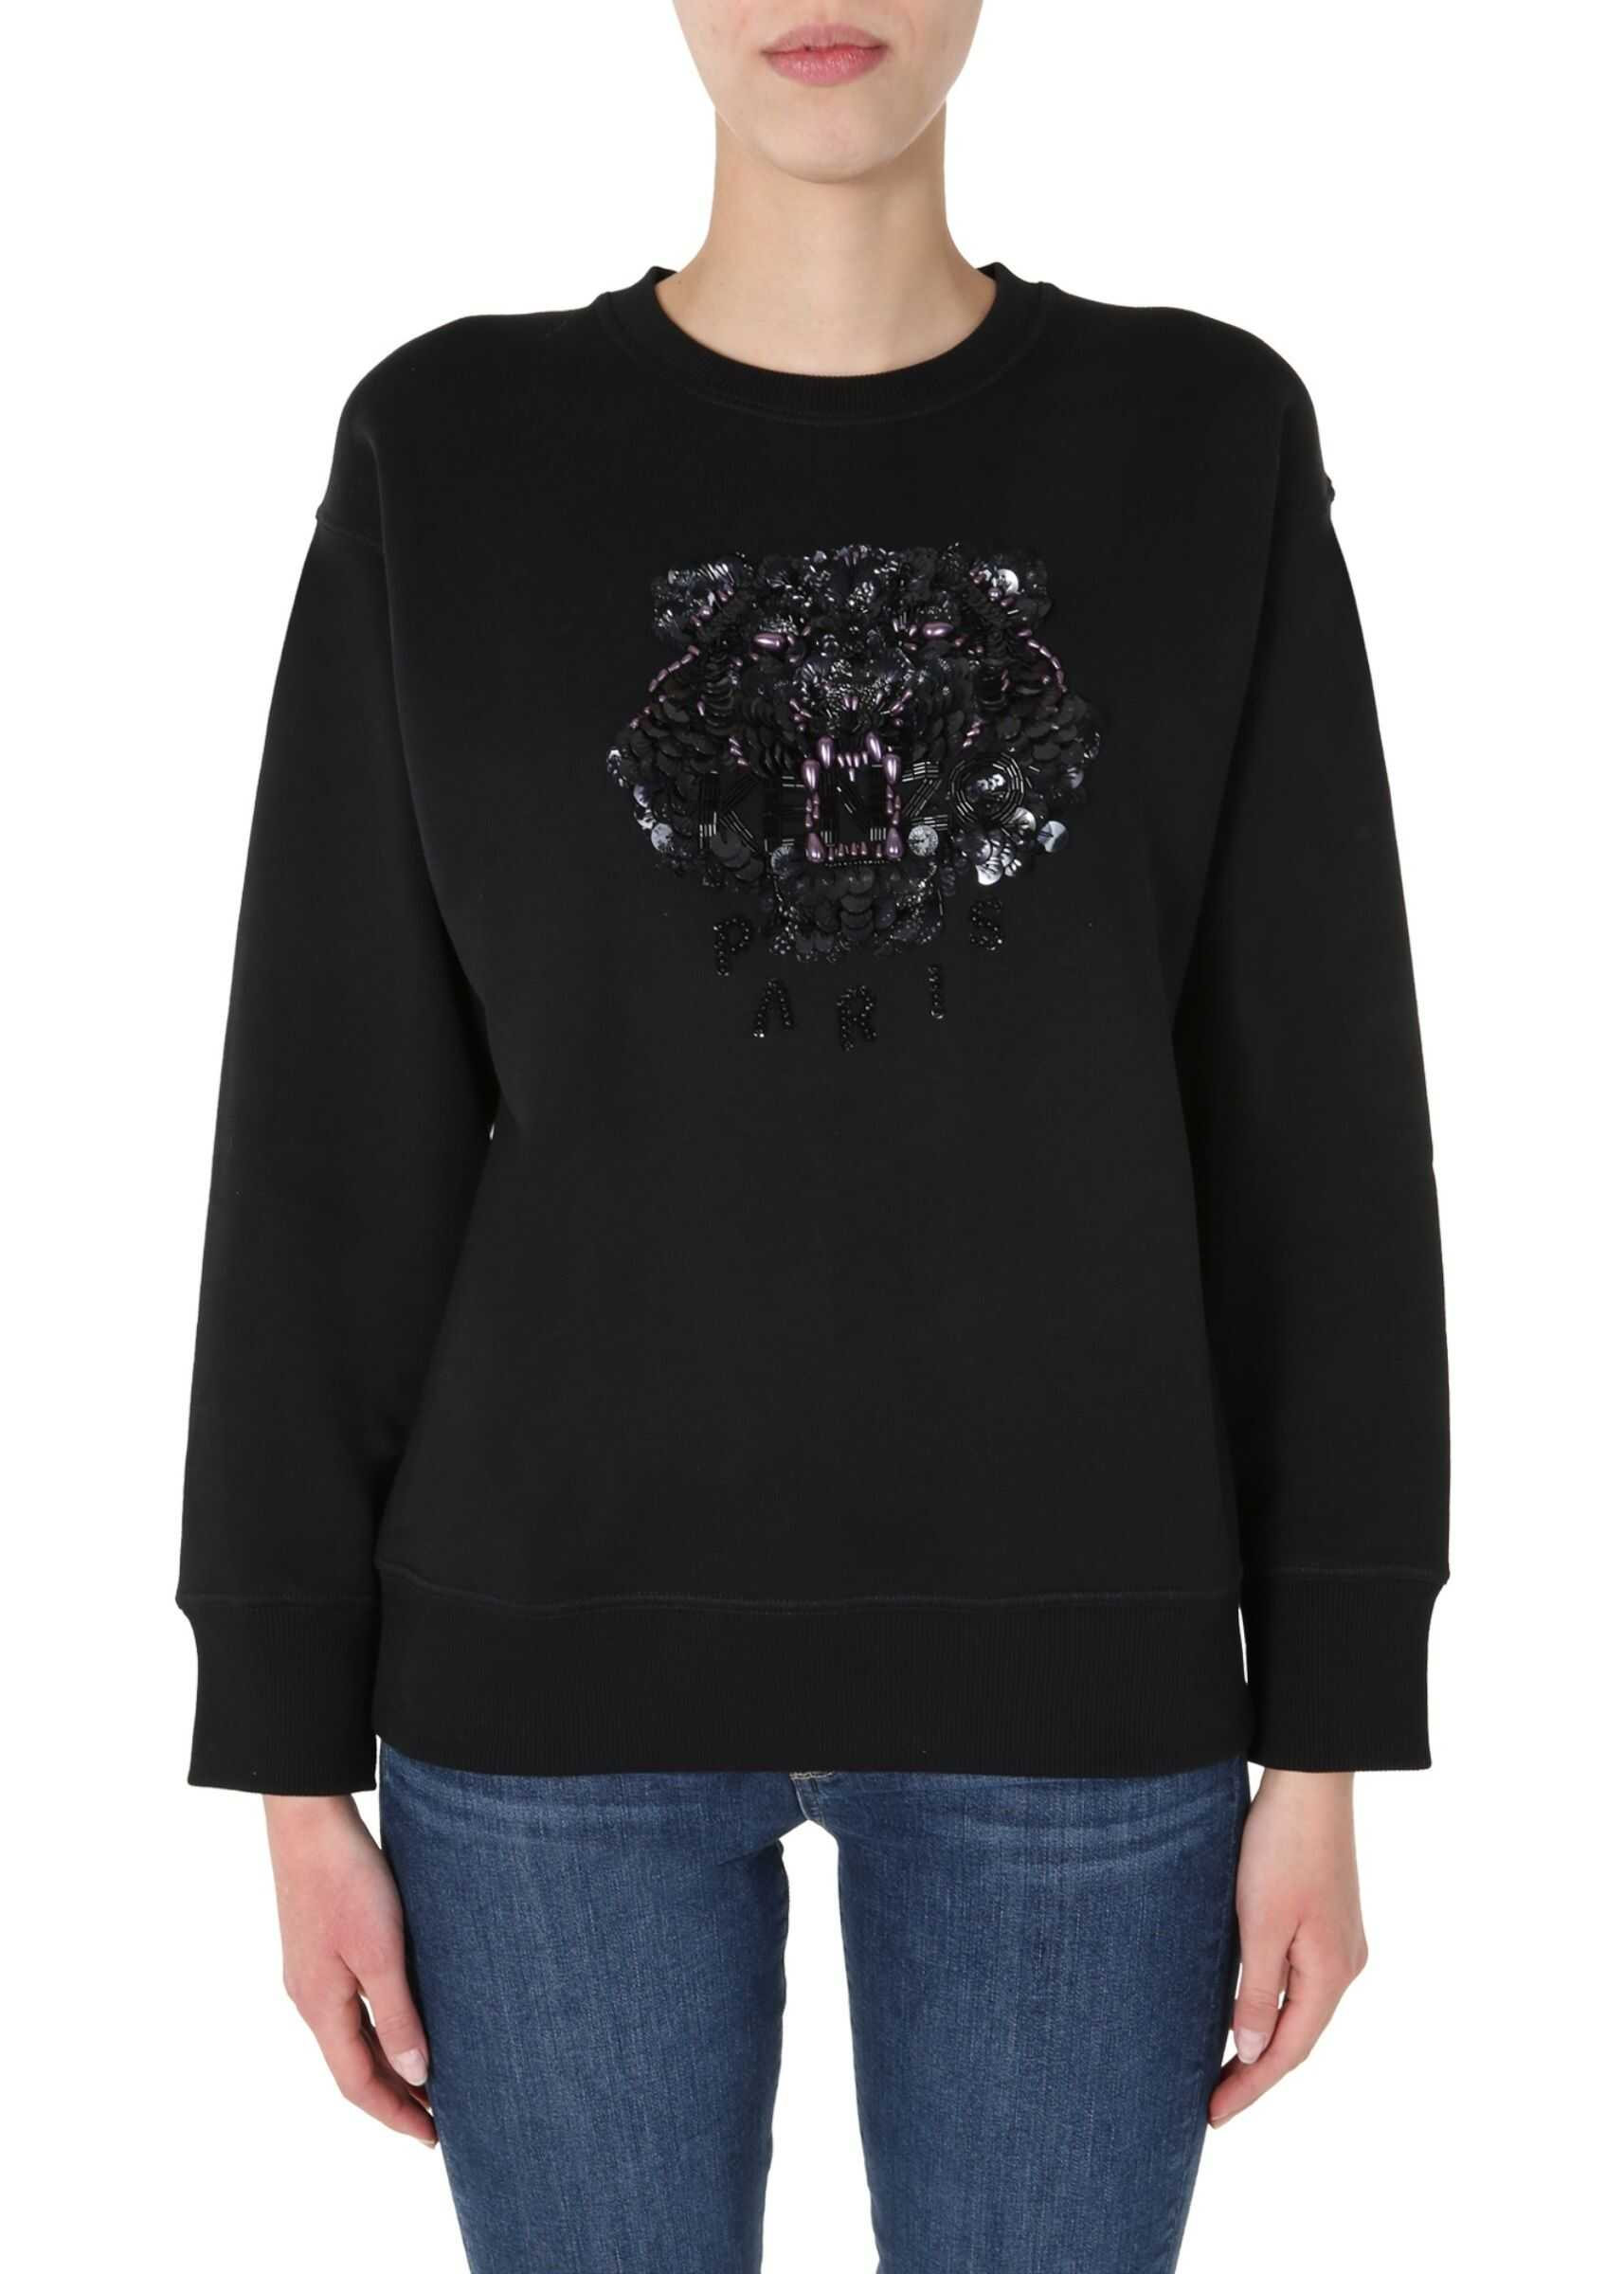 Kenzo Round Neck Sweatshirt BLACK